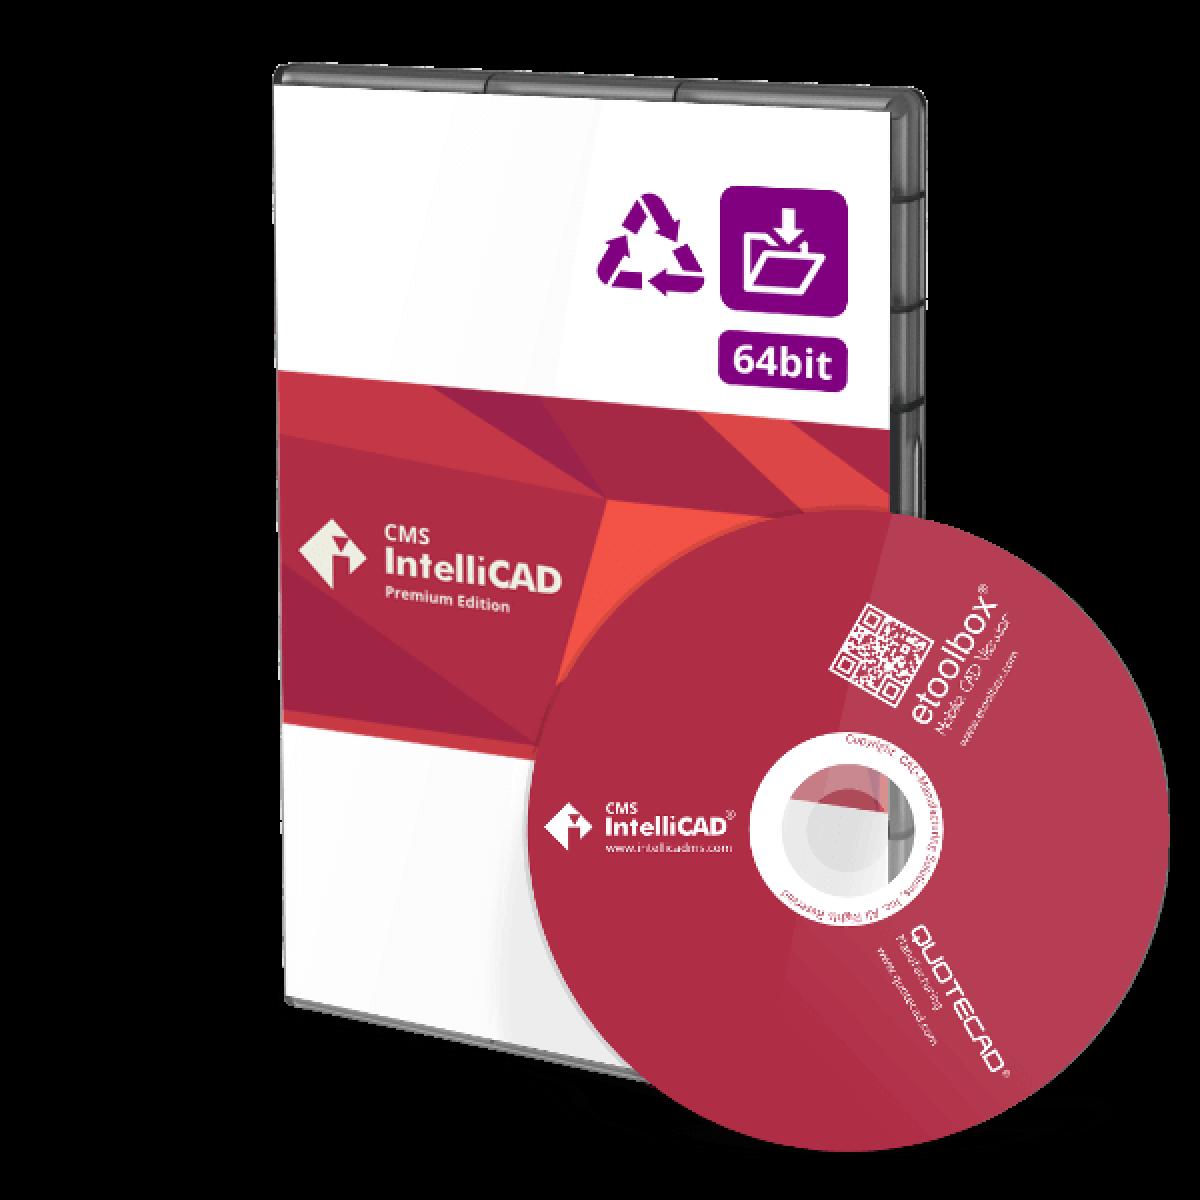 CMS IntellICAD 8.3 PE Upgrade